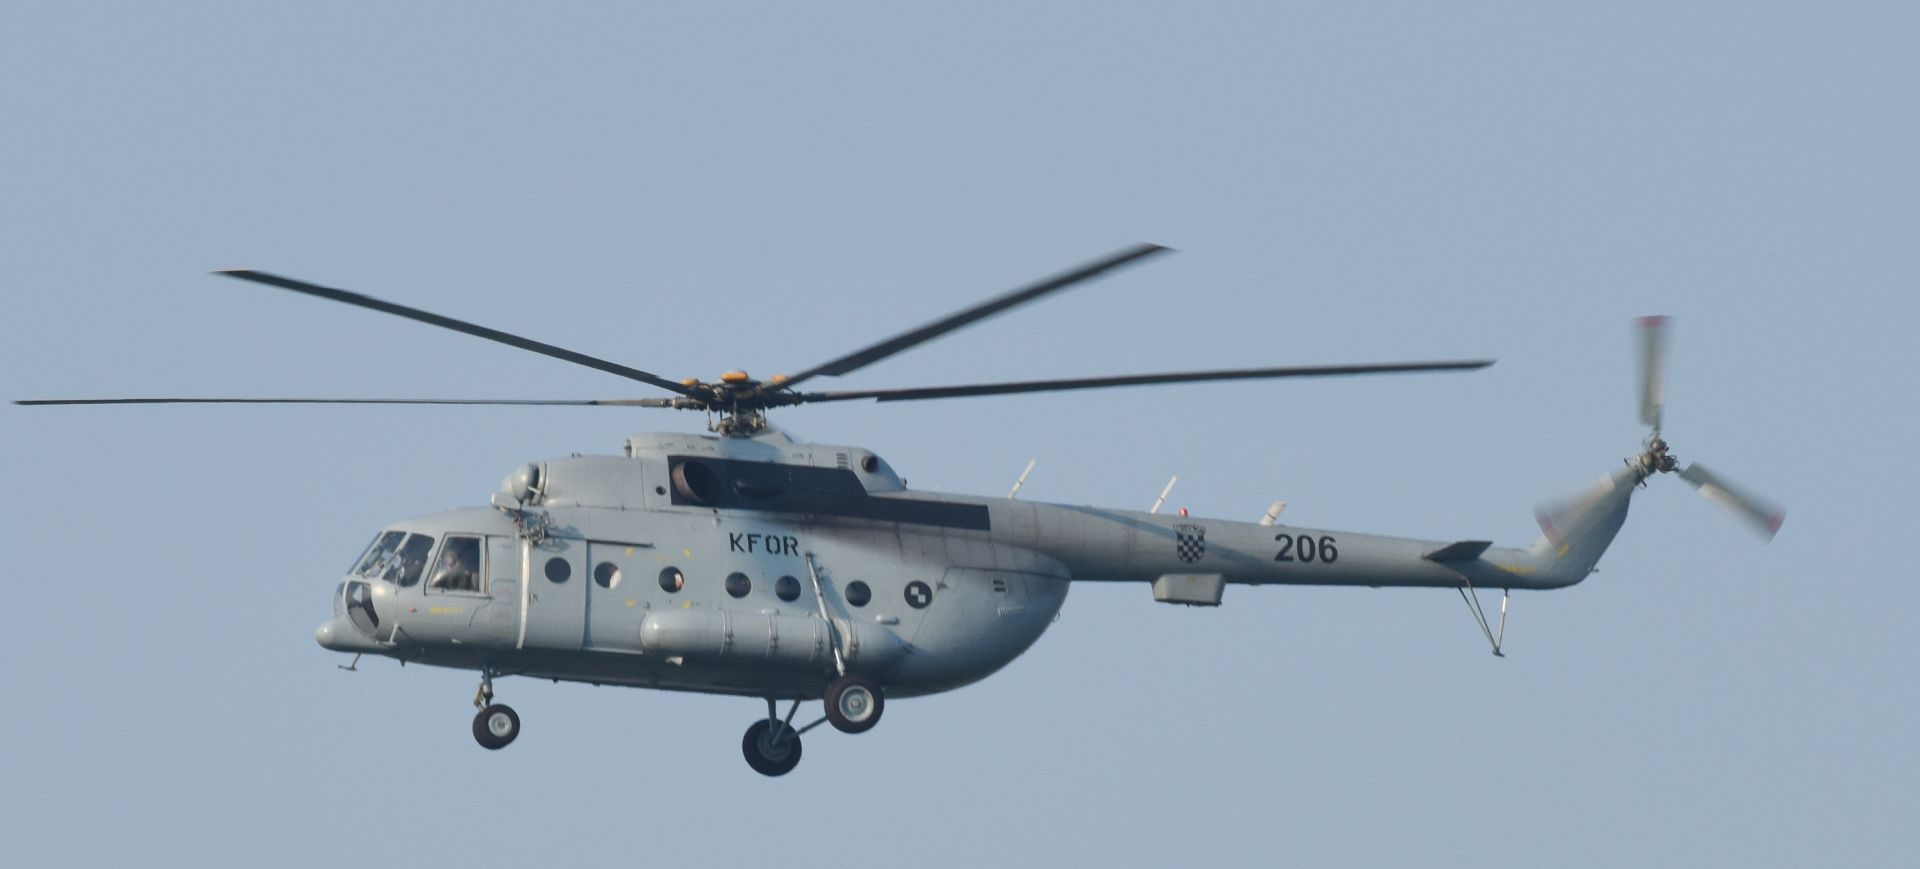 SIBIR U padu ruskog helikoptera 18 mrtvih